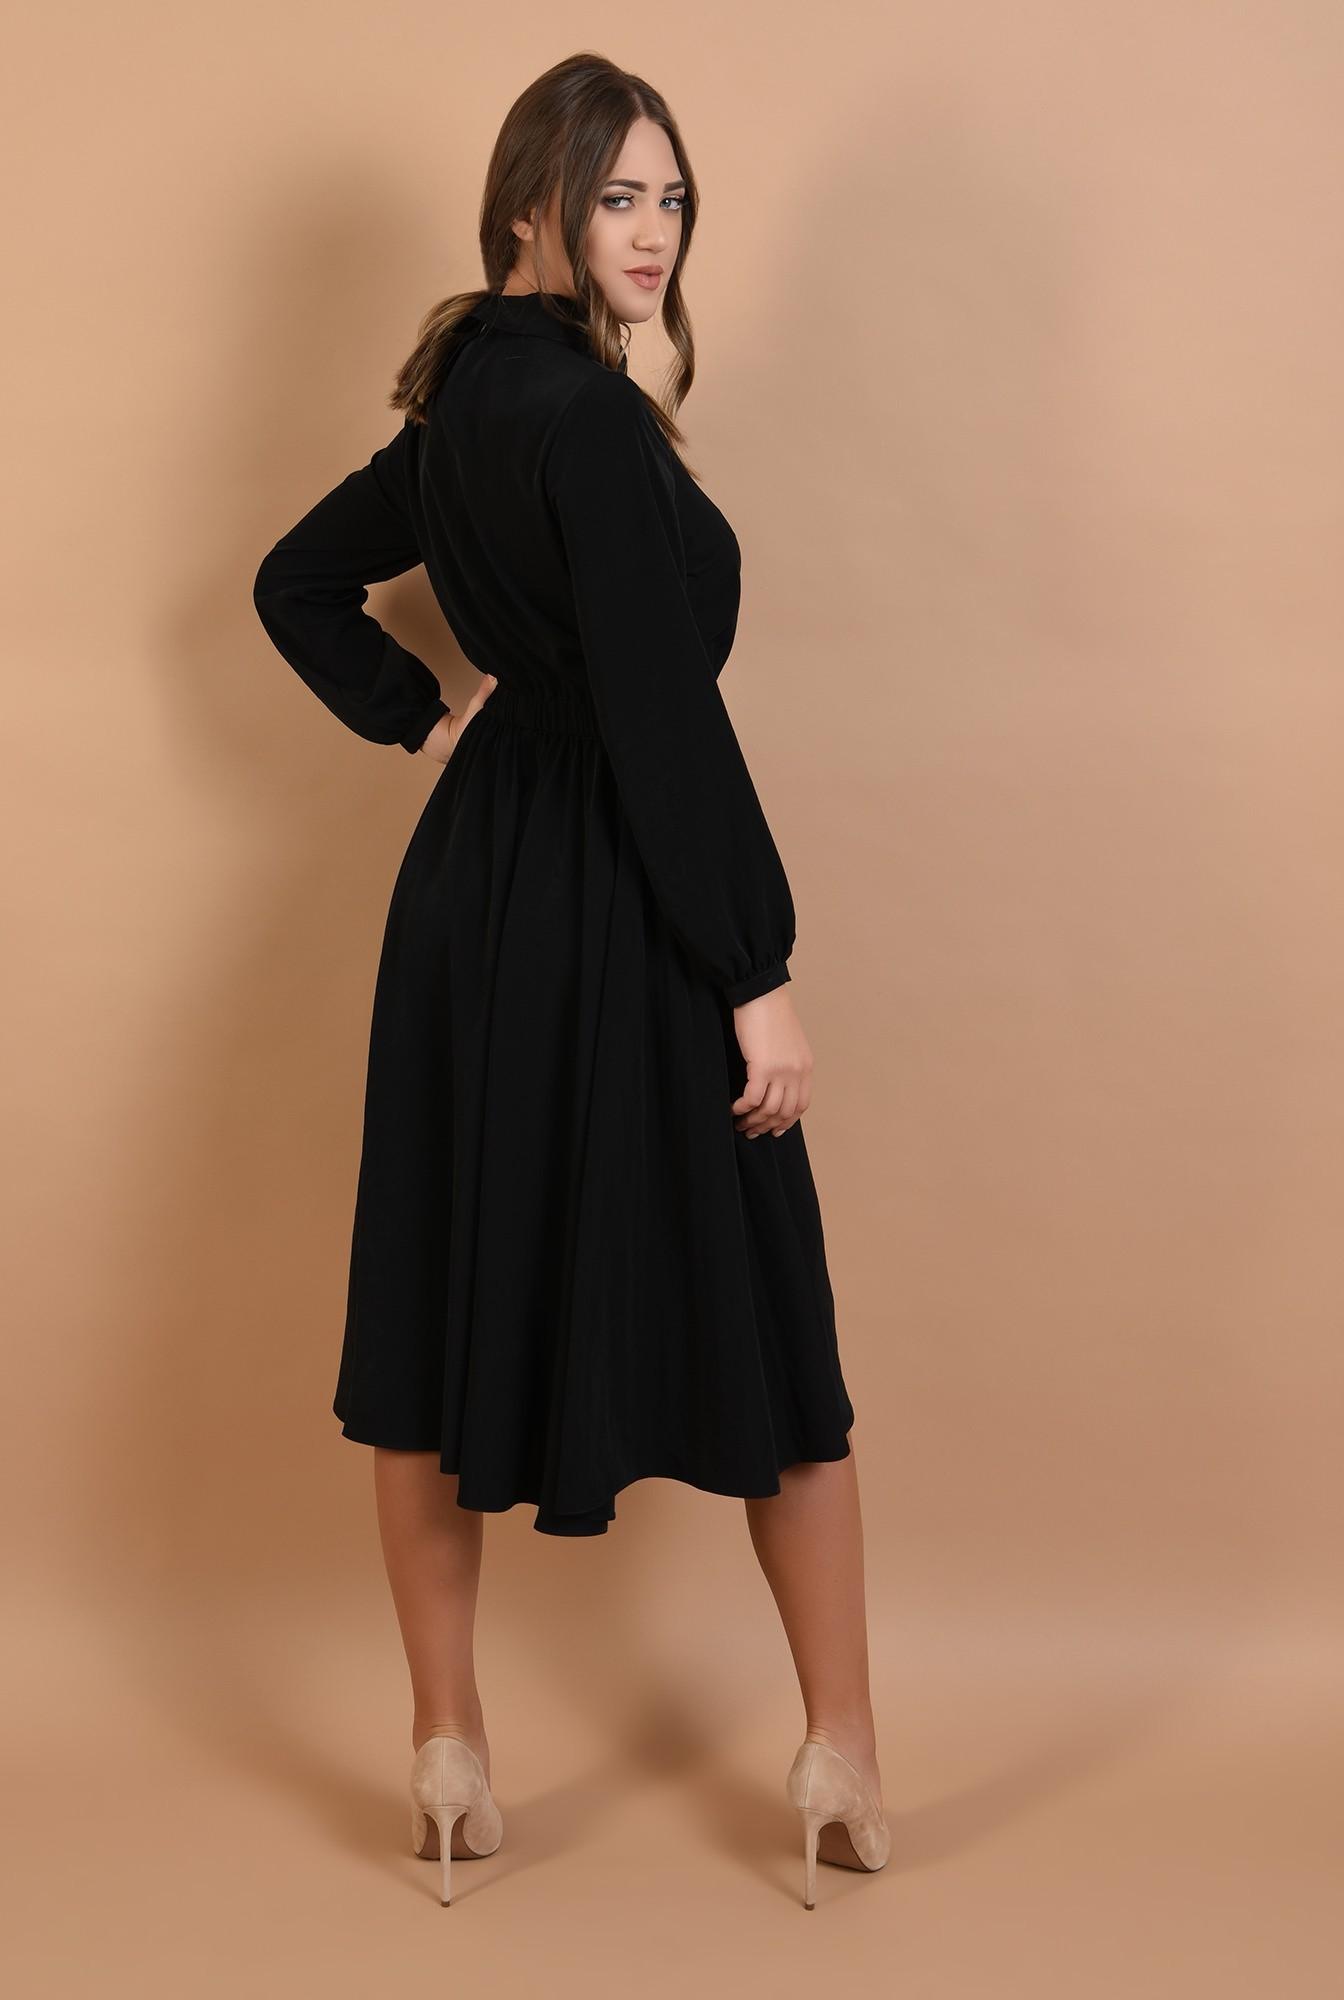 2 - 360 - rochie casual, midi, evazata, talie variabila, guler ascutit